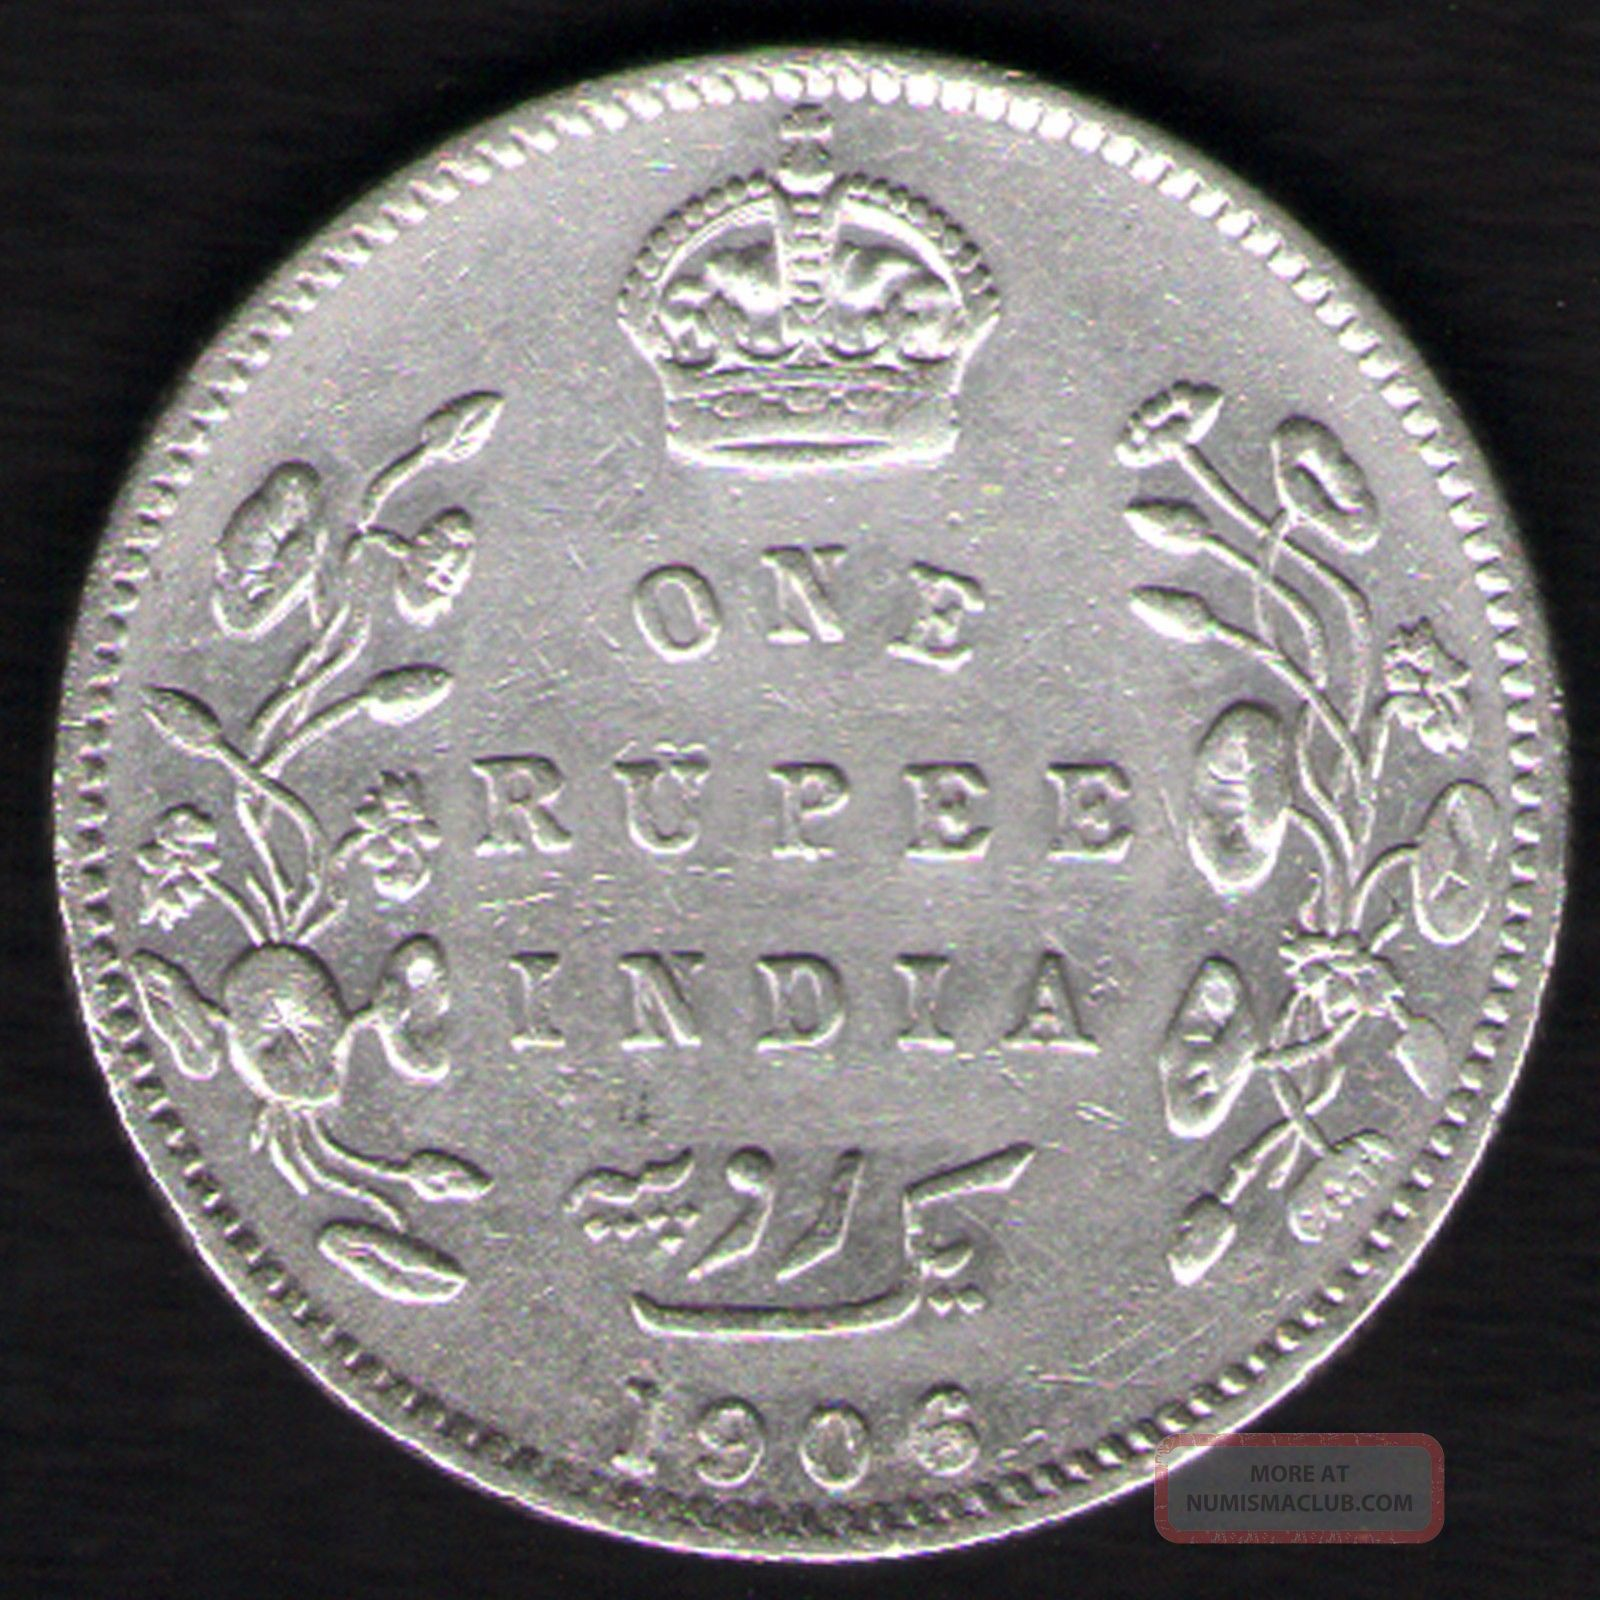 British India - 1906 - Edward Vii One Rupee Silver X - Fine Coin Ex - Rare Date British photo